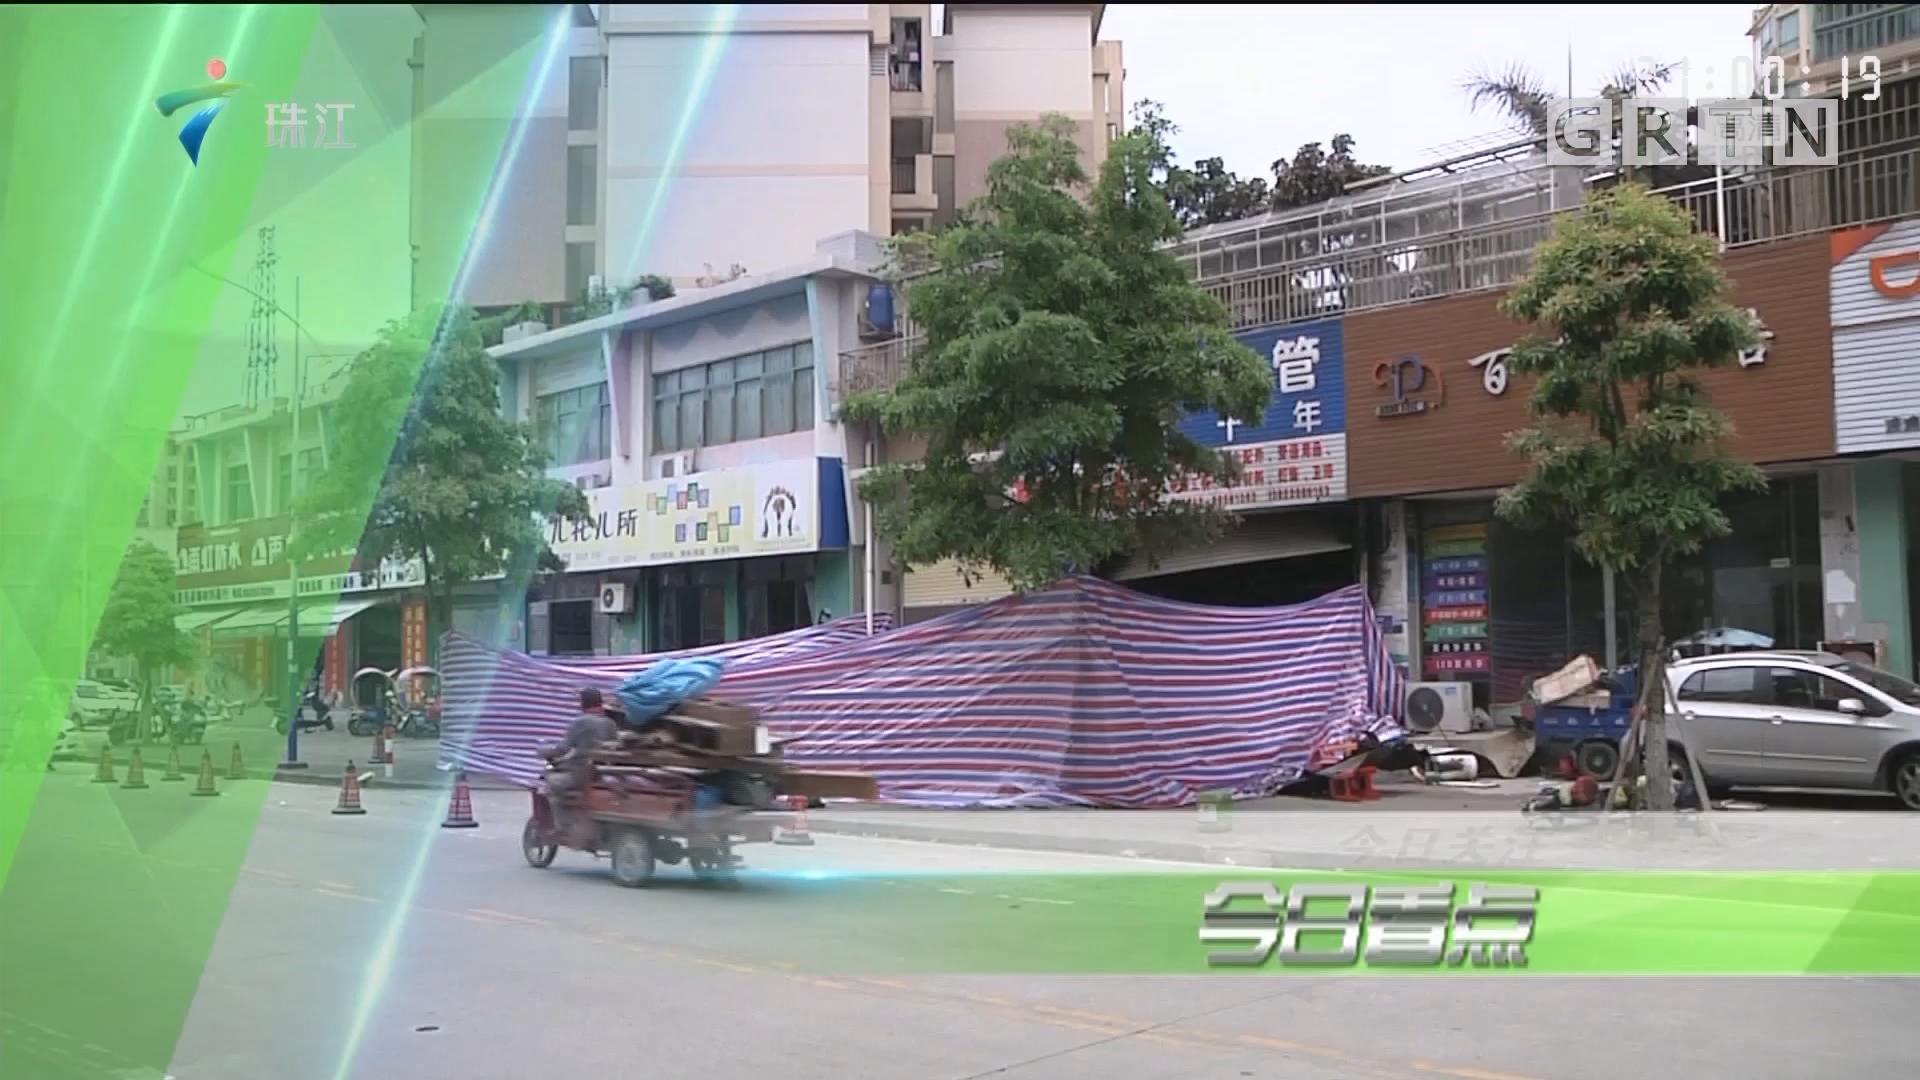 [HD][2019-06-27]今日关注:追踪:中山消防积极清查店铺火灾隐患